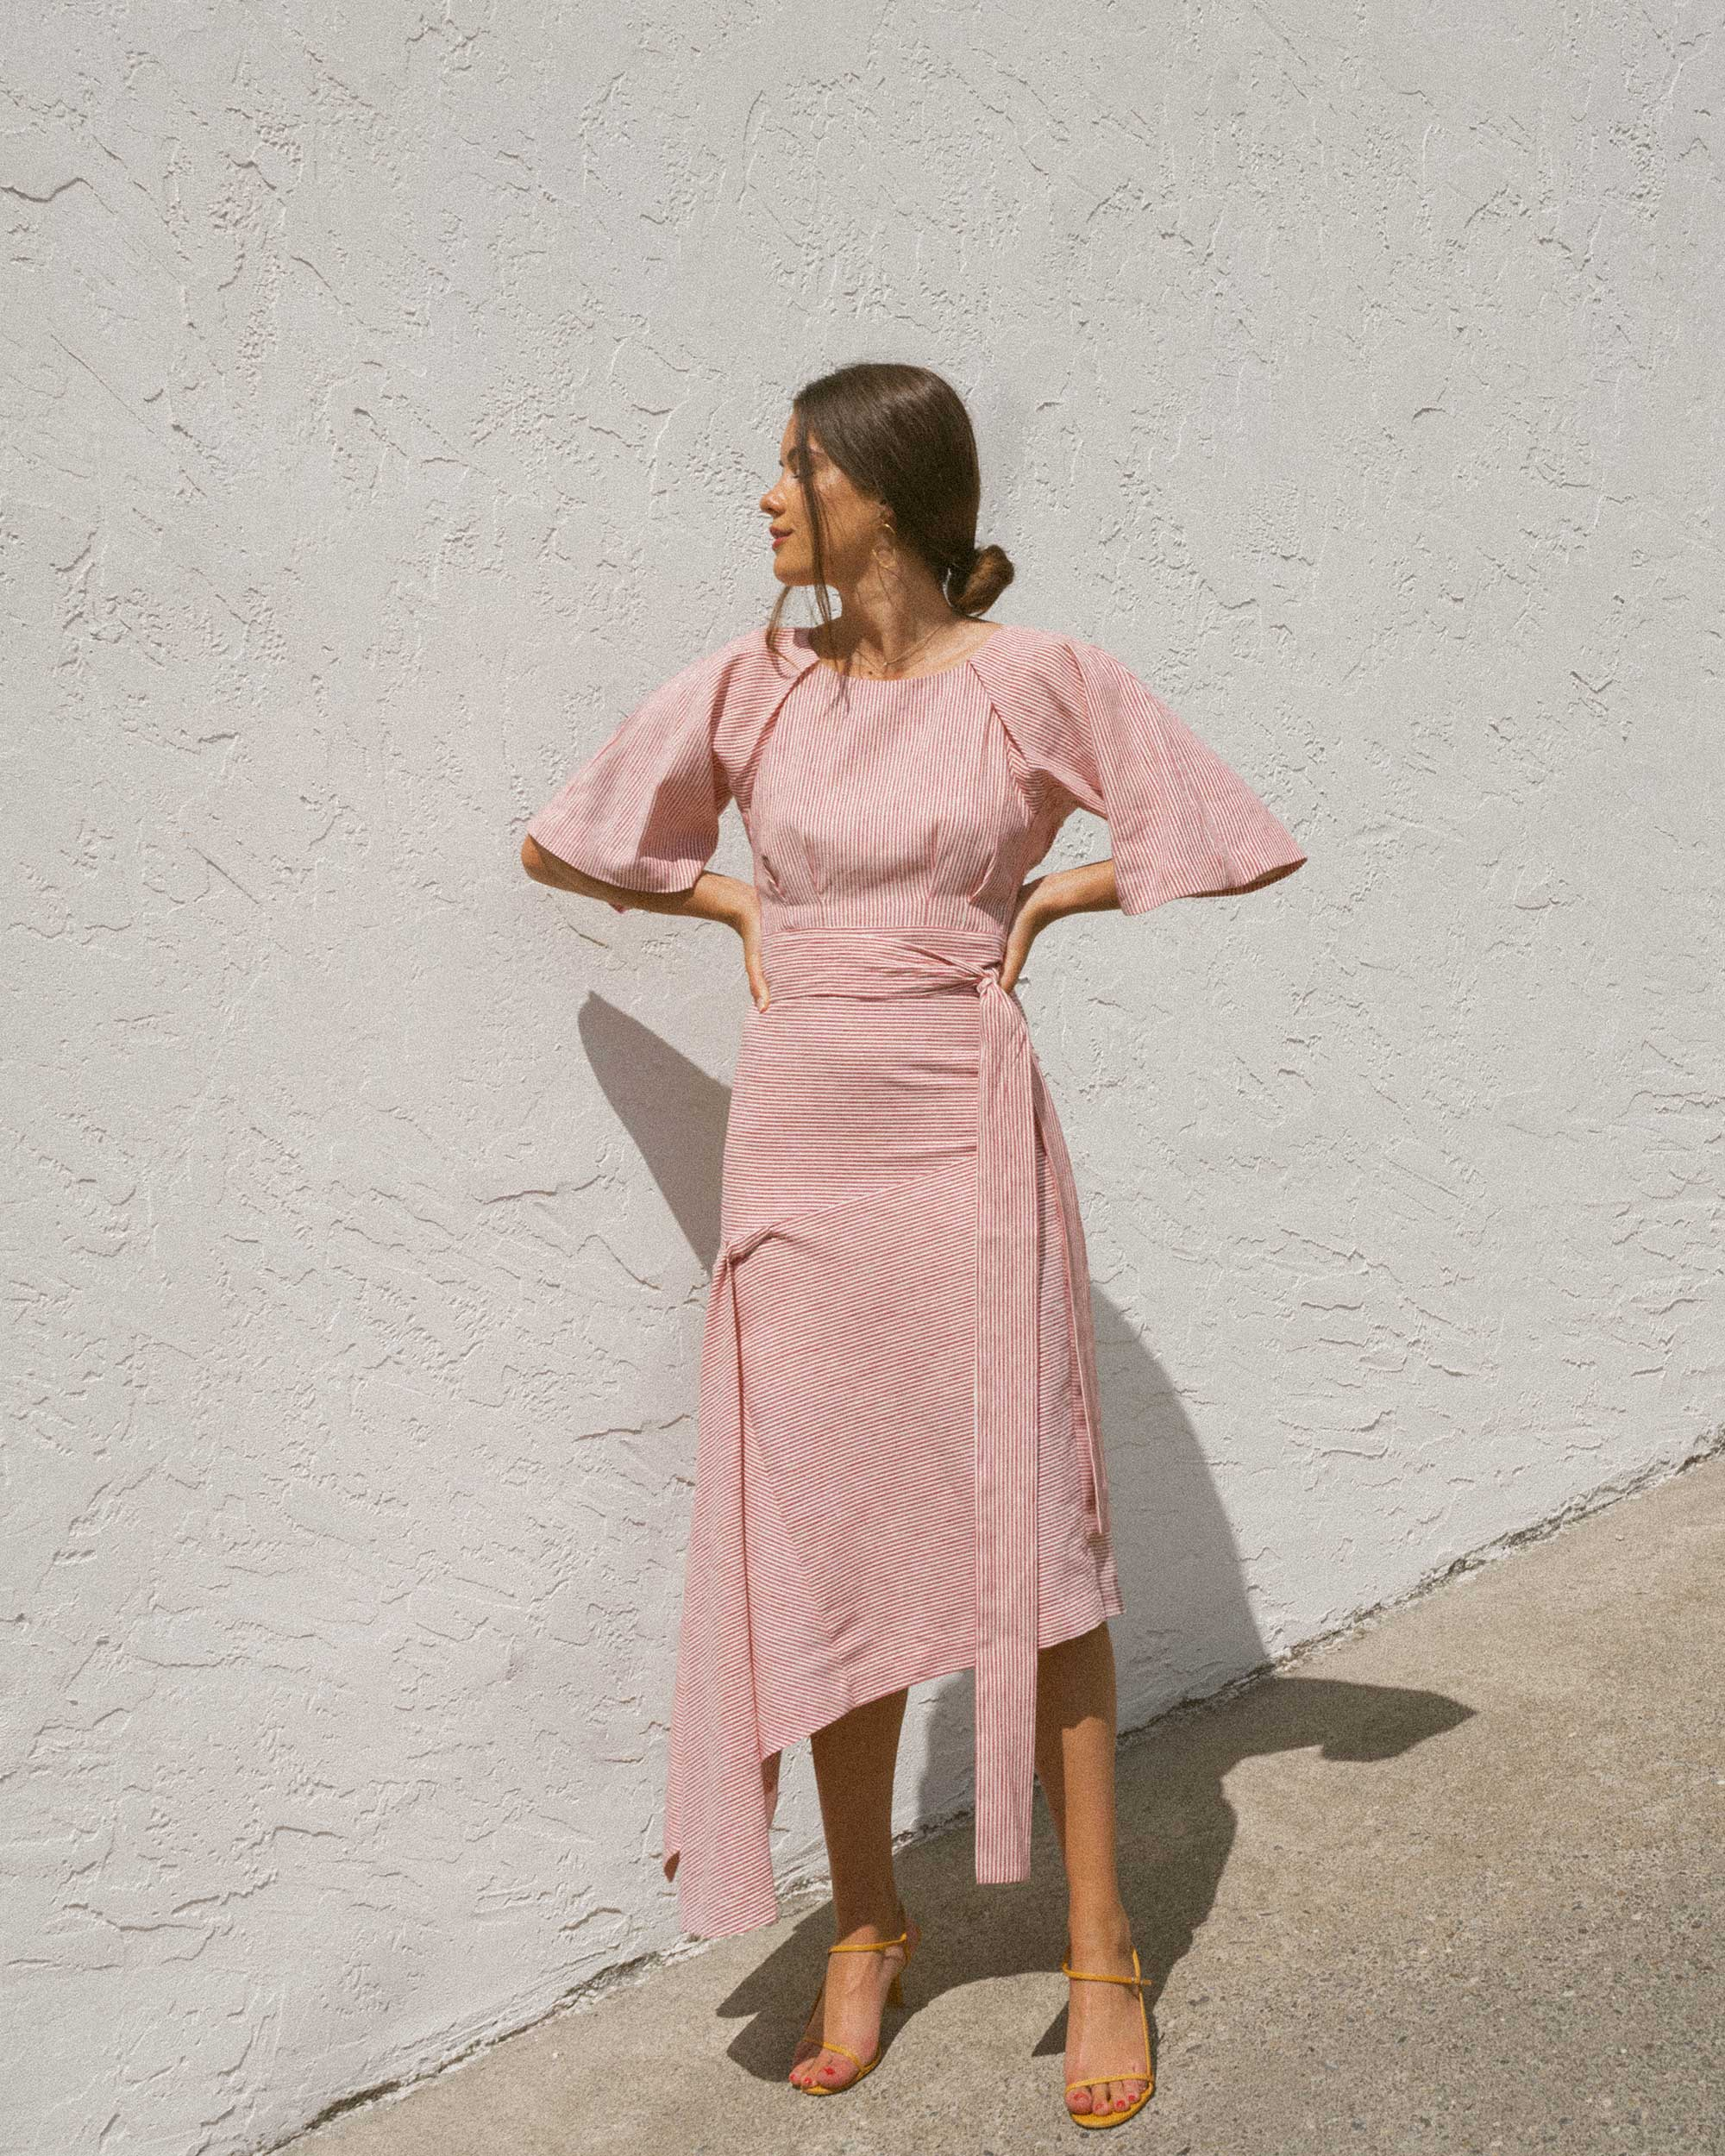 Sarah Butler of Sarah Styles wears BcbgMaxAzria Pinstripe Asymmetric Skirt and Pinstripe Cutout Back Cropped Top in Seattle   @sarahchristine -4.jpg